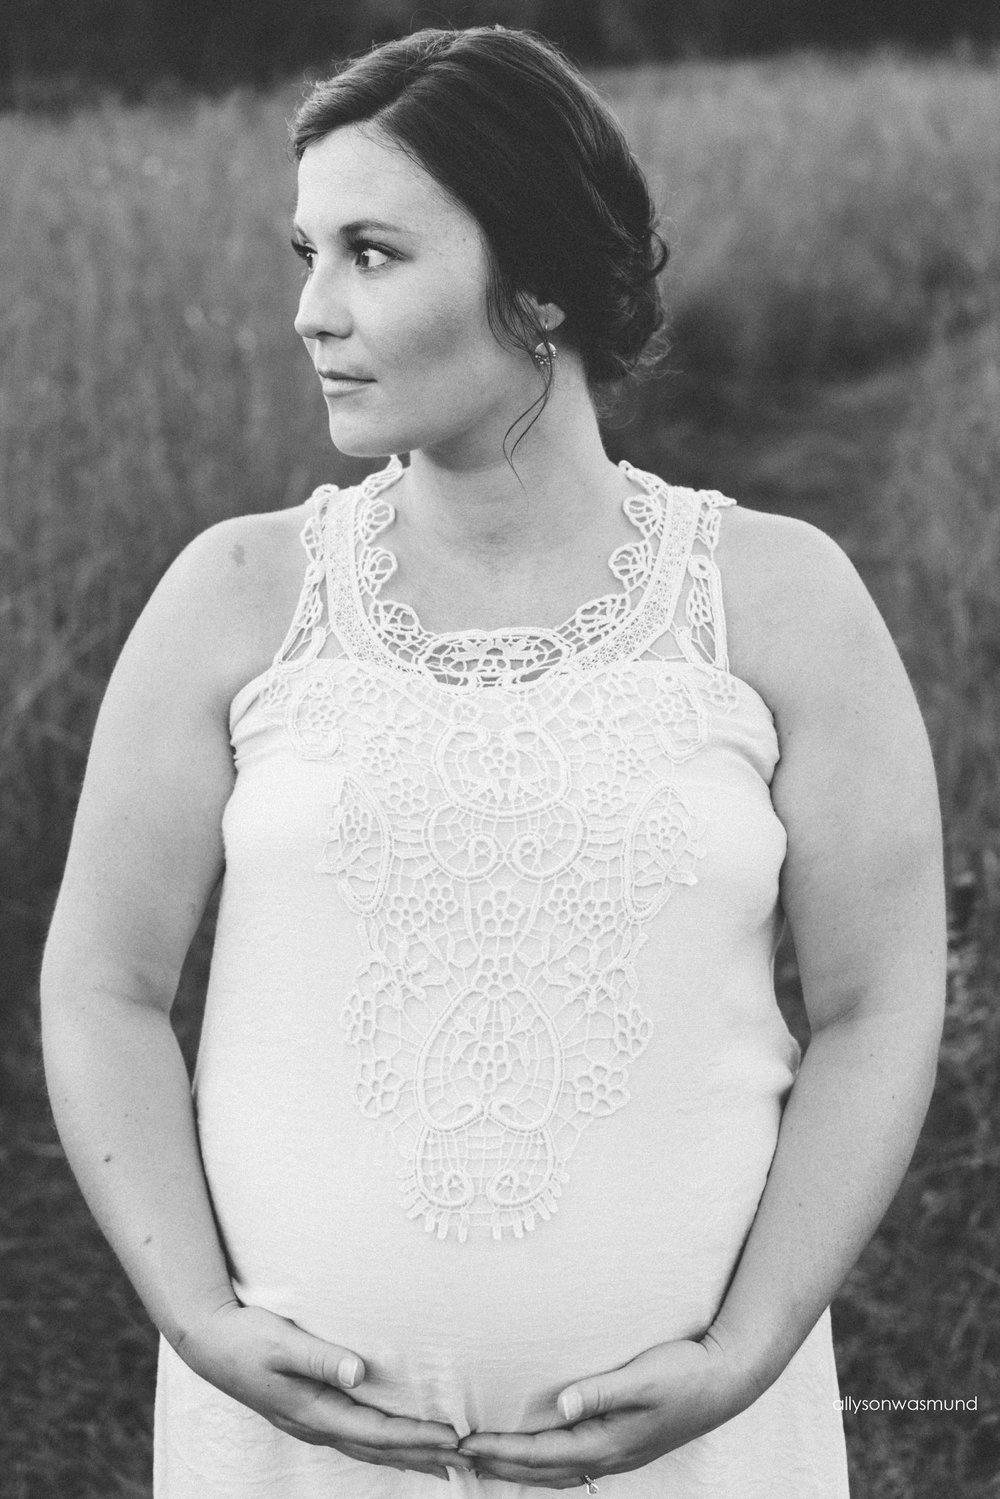 st-paul-mn-outdoor-maternity-photographer_0064.jpg